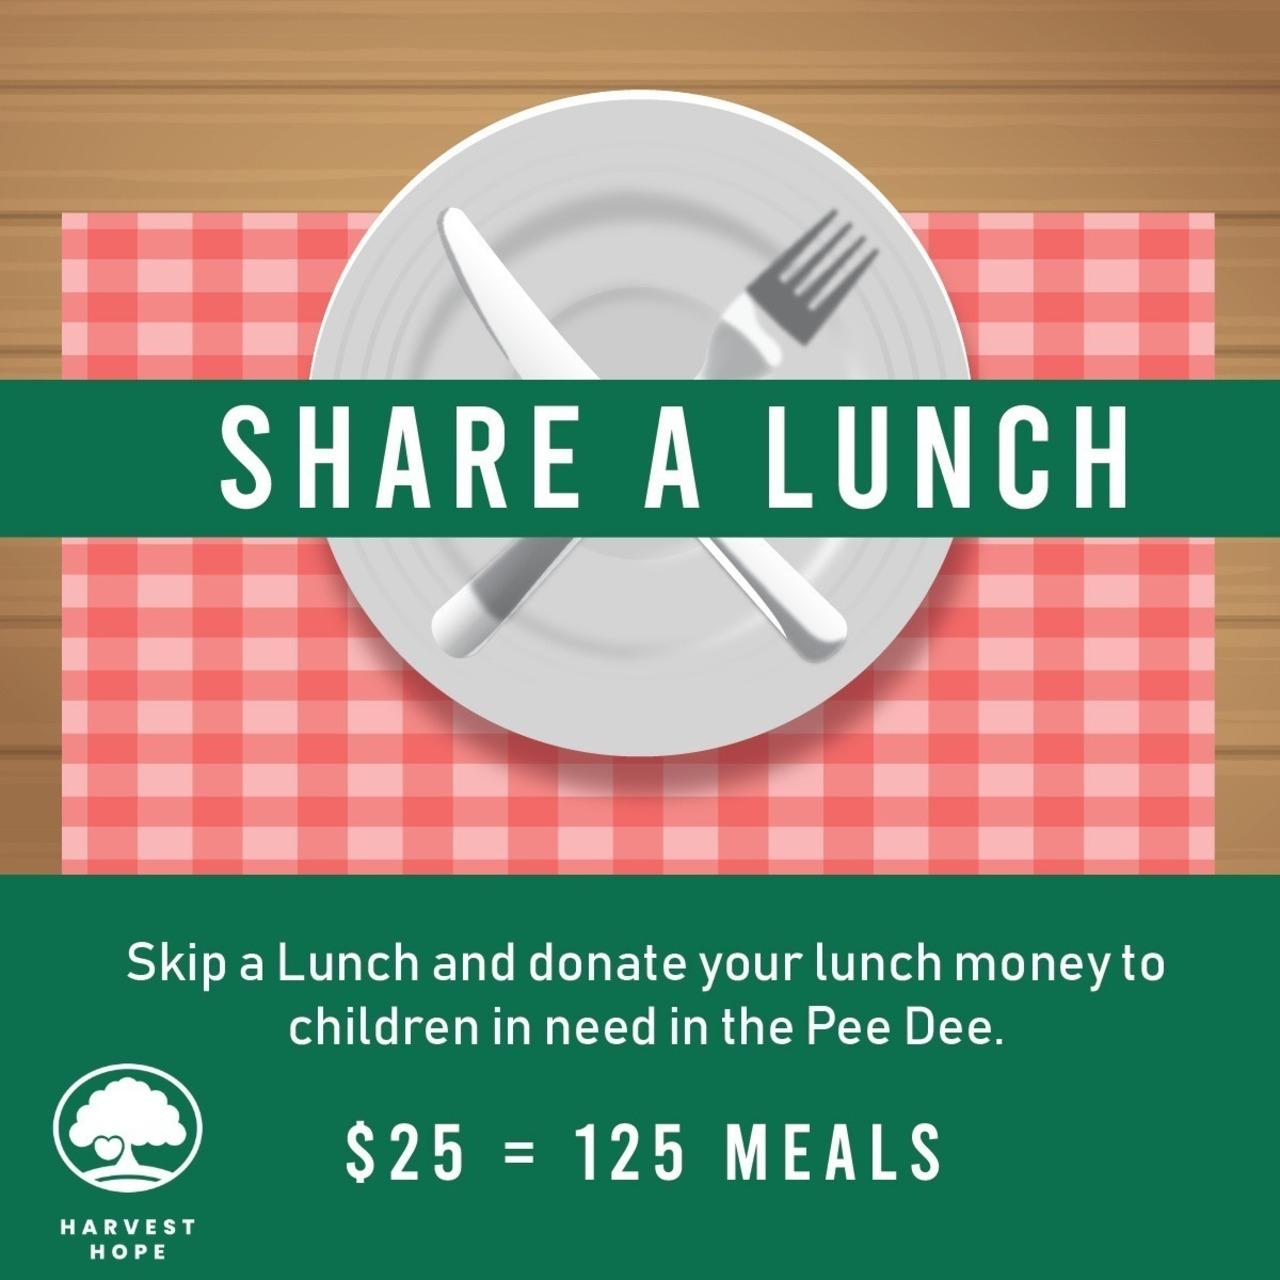 Emily Myers' Share a Lunch Fundraiser for Harvest Hope